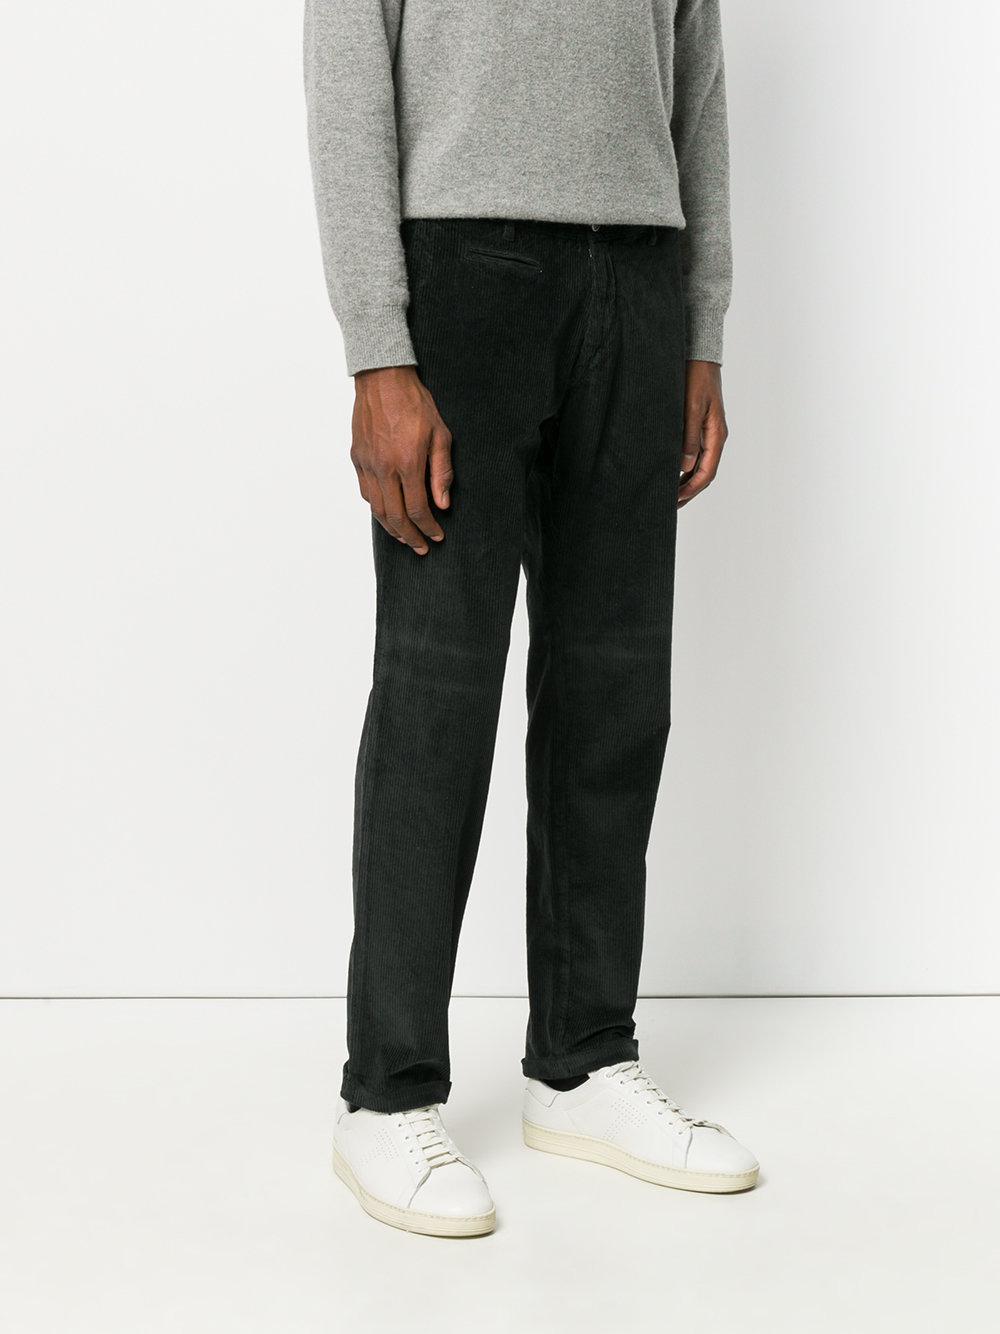 Barena Corduroy Trousers in Black for Men